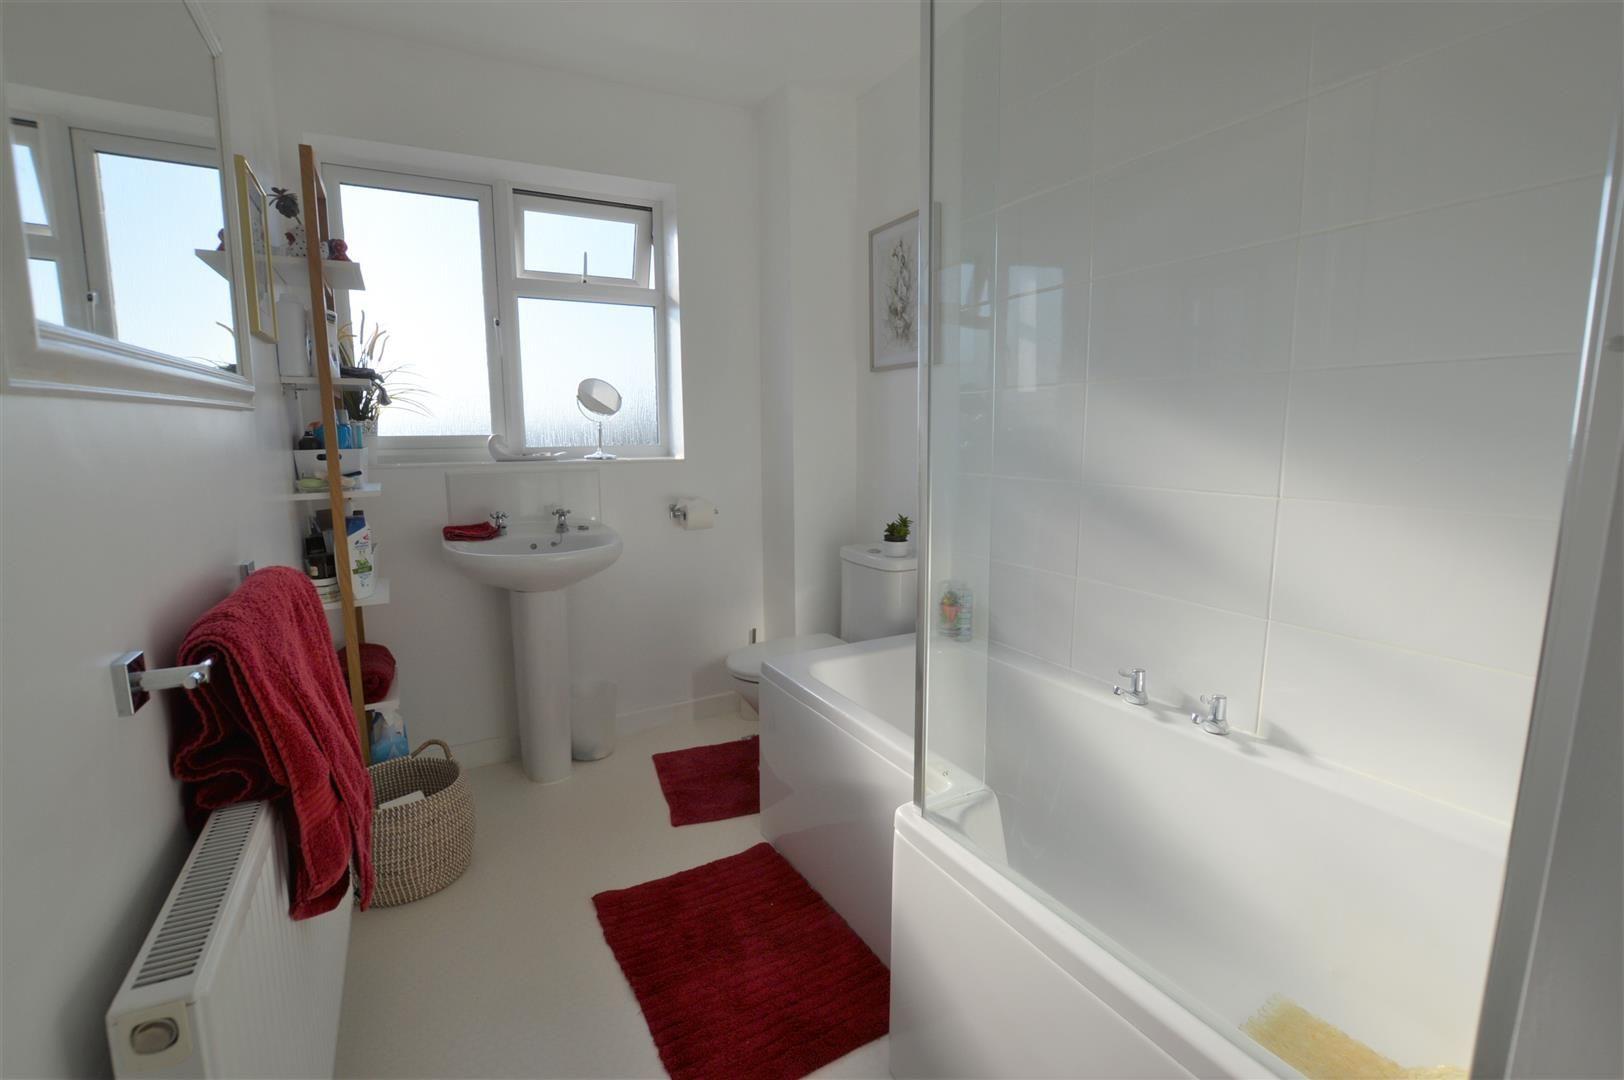 4 bed semi-detached for sale in Bromyard 8